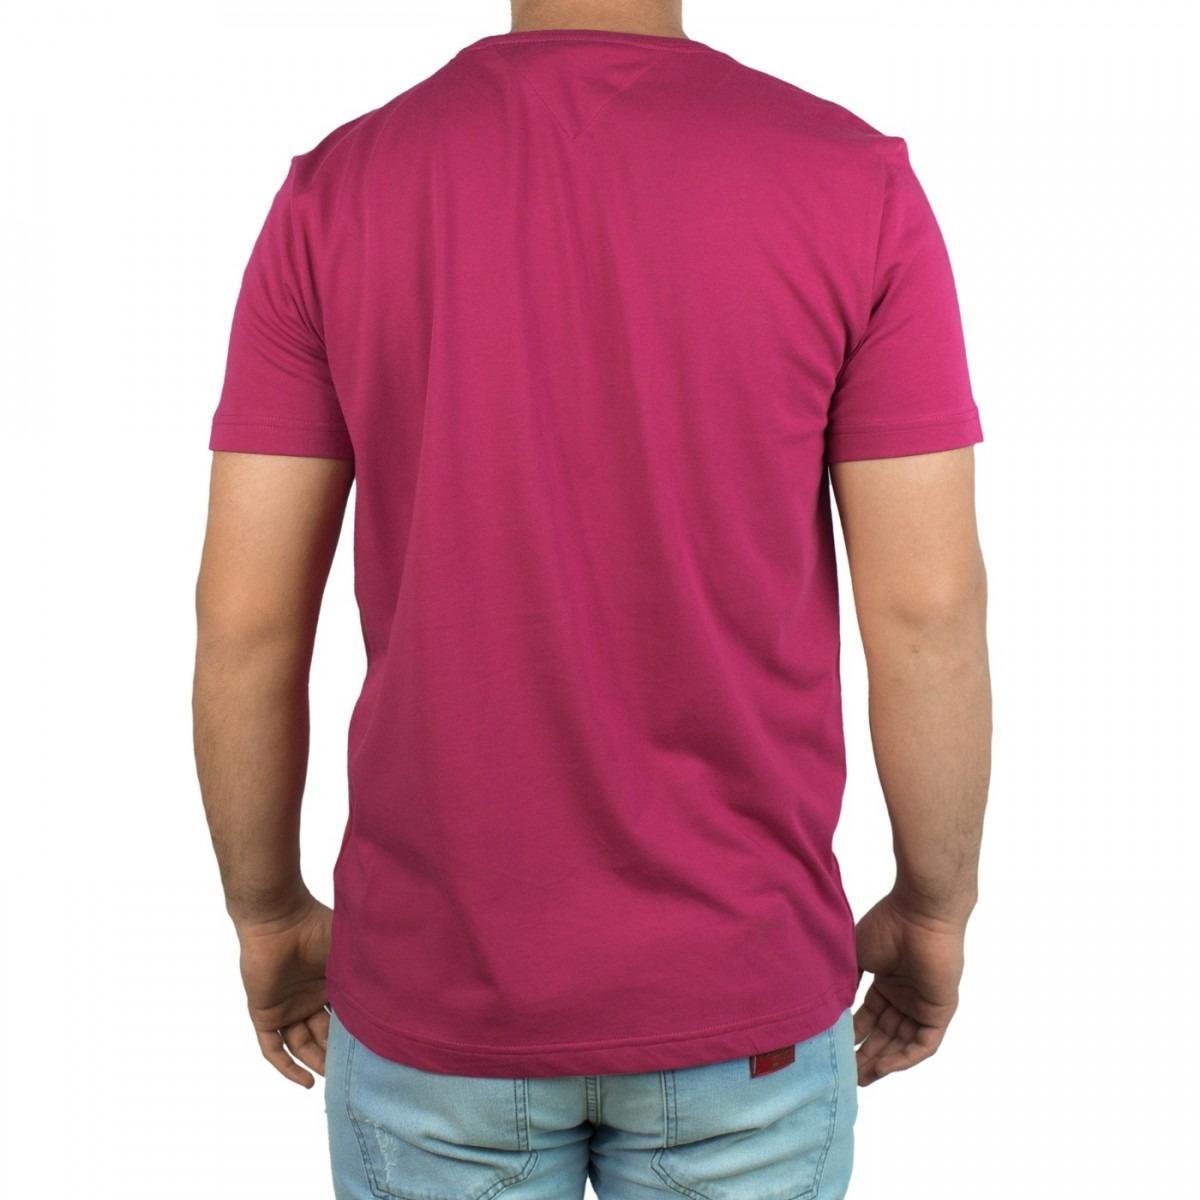 4a4927dfc152d Camiseta Masculina Tommy Hilfiger Básica Manga Curta - R  179